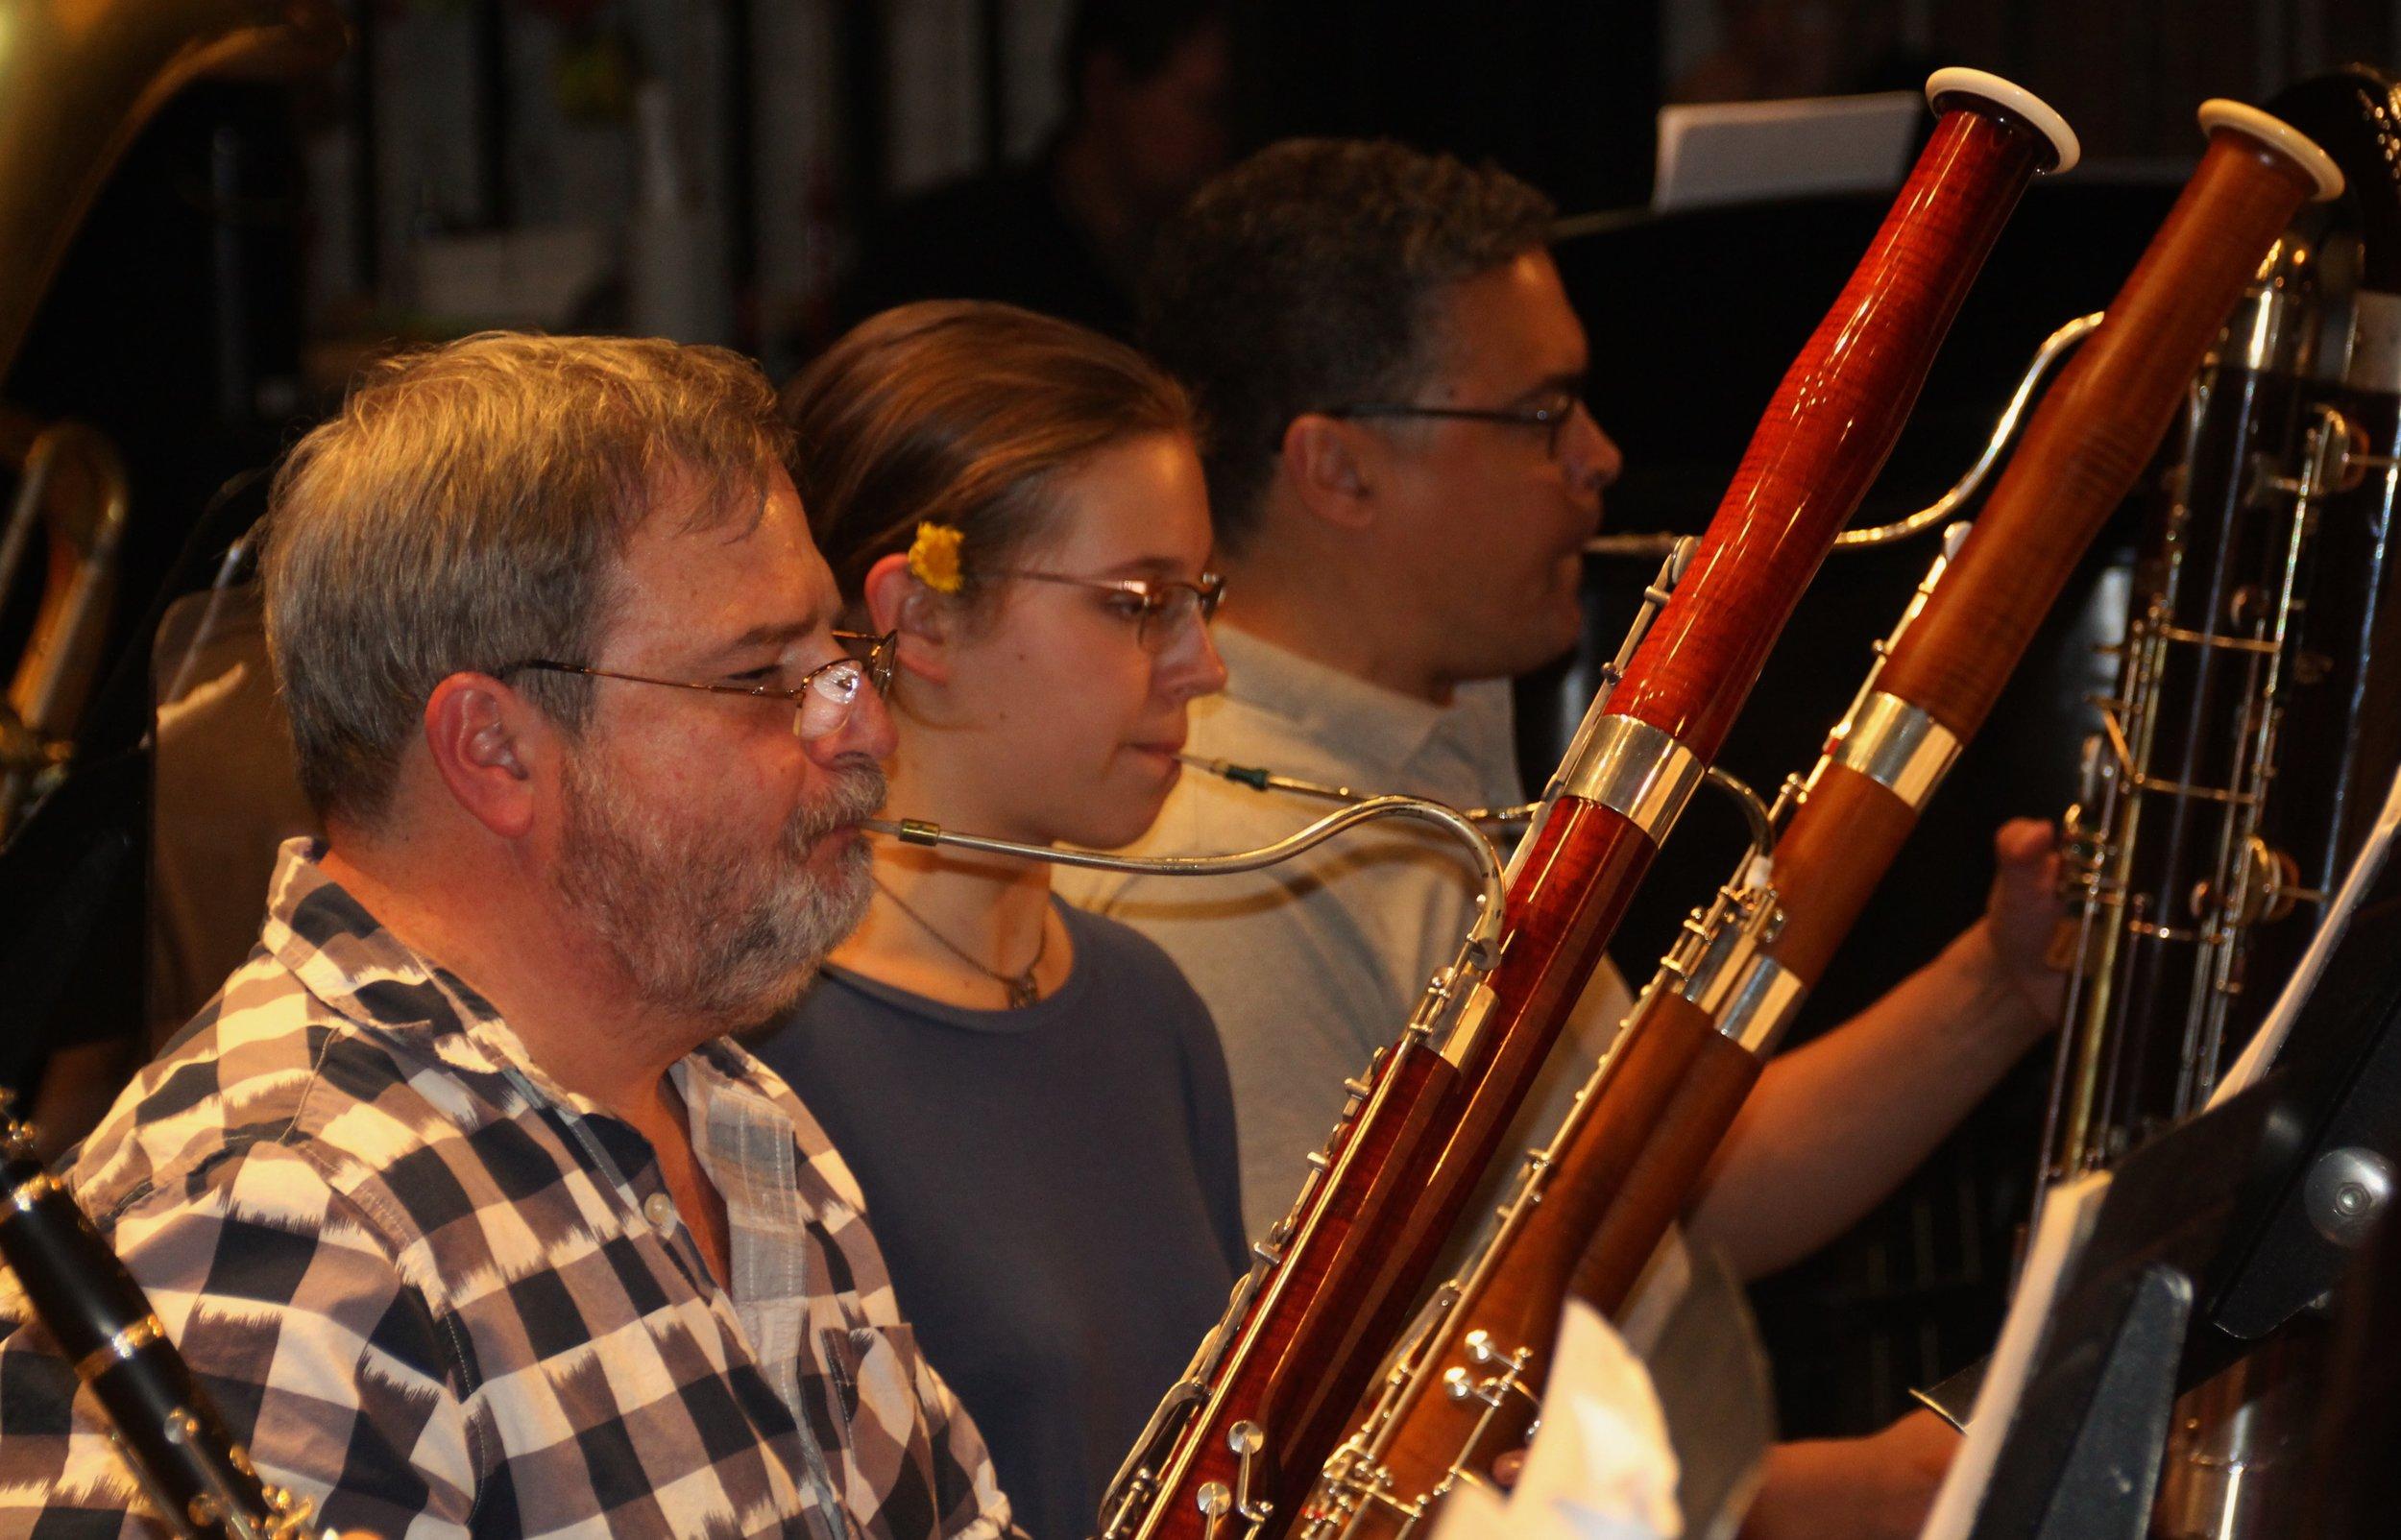 Student bassoonist Sequoia Kessler works alongside GBS professionals